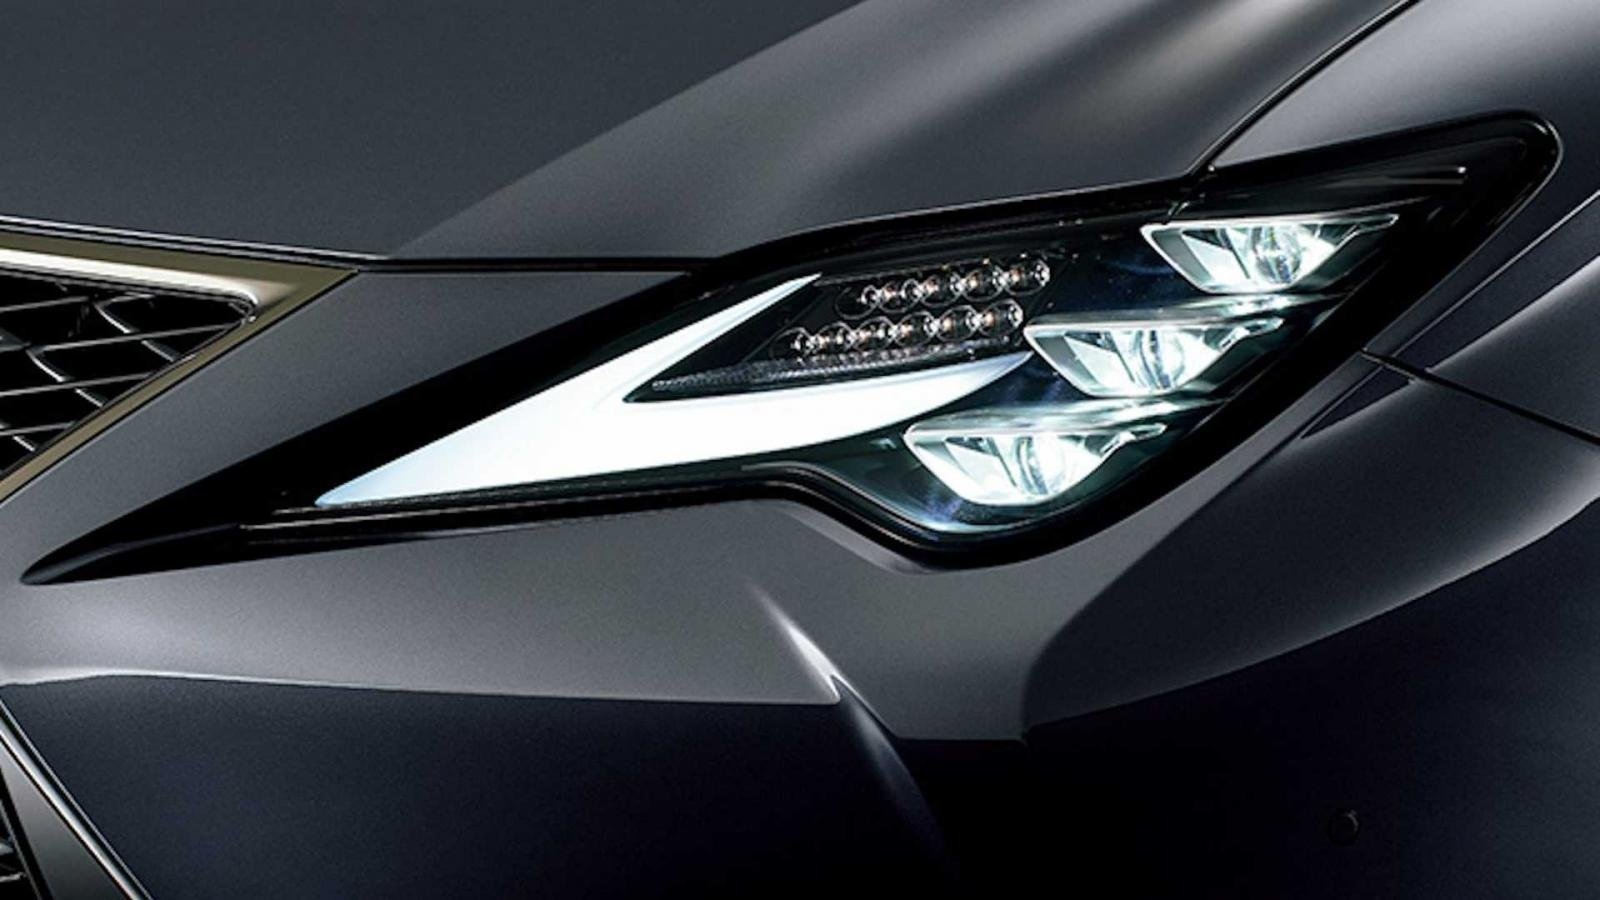 Lexus RC Emotional Ash Edition ngoại thất - 1.